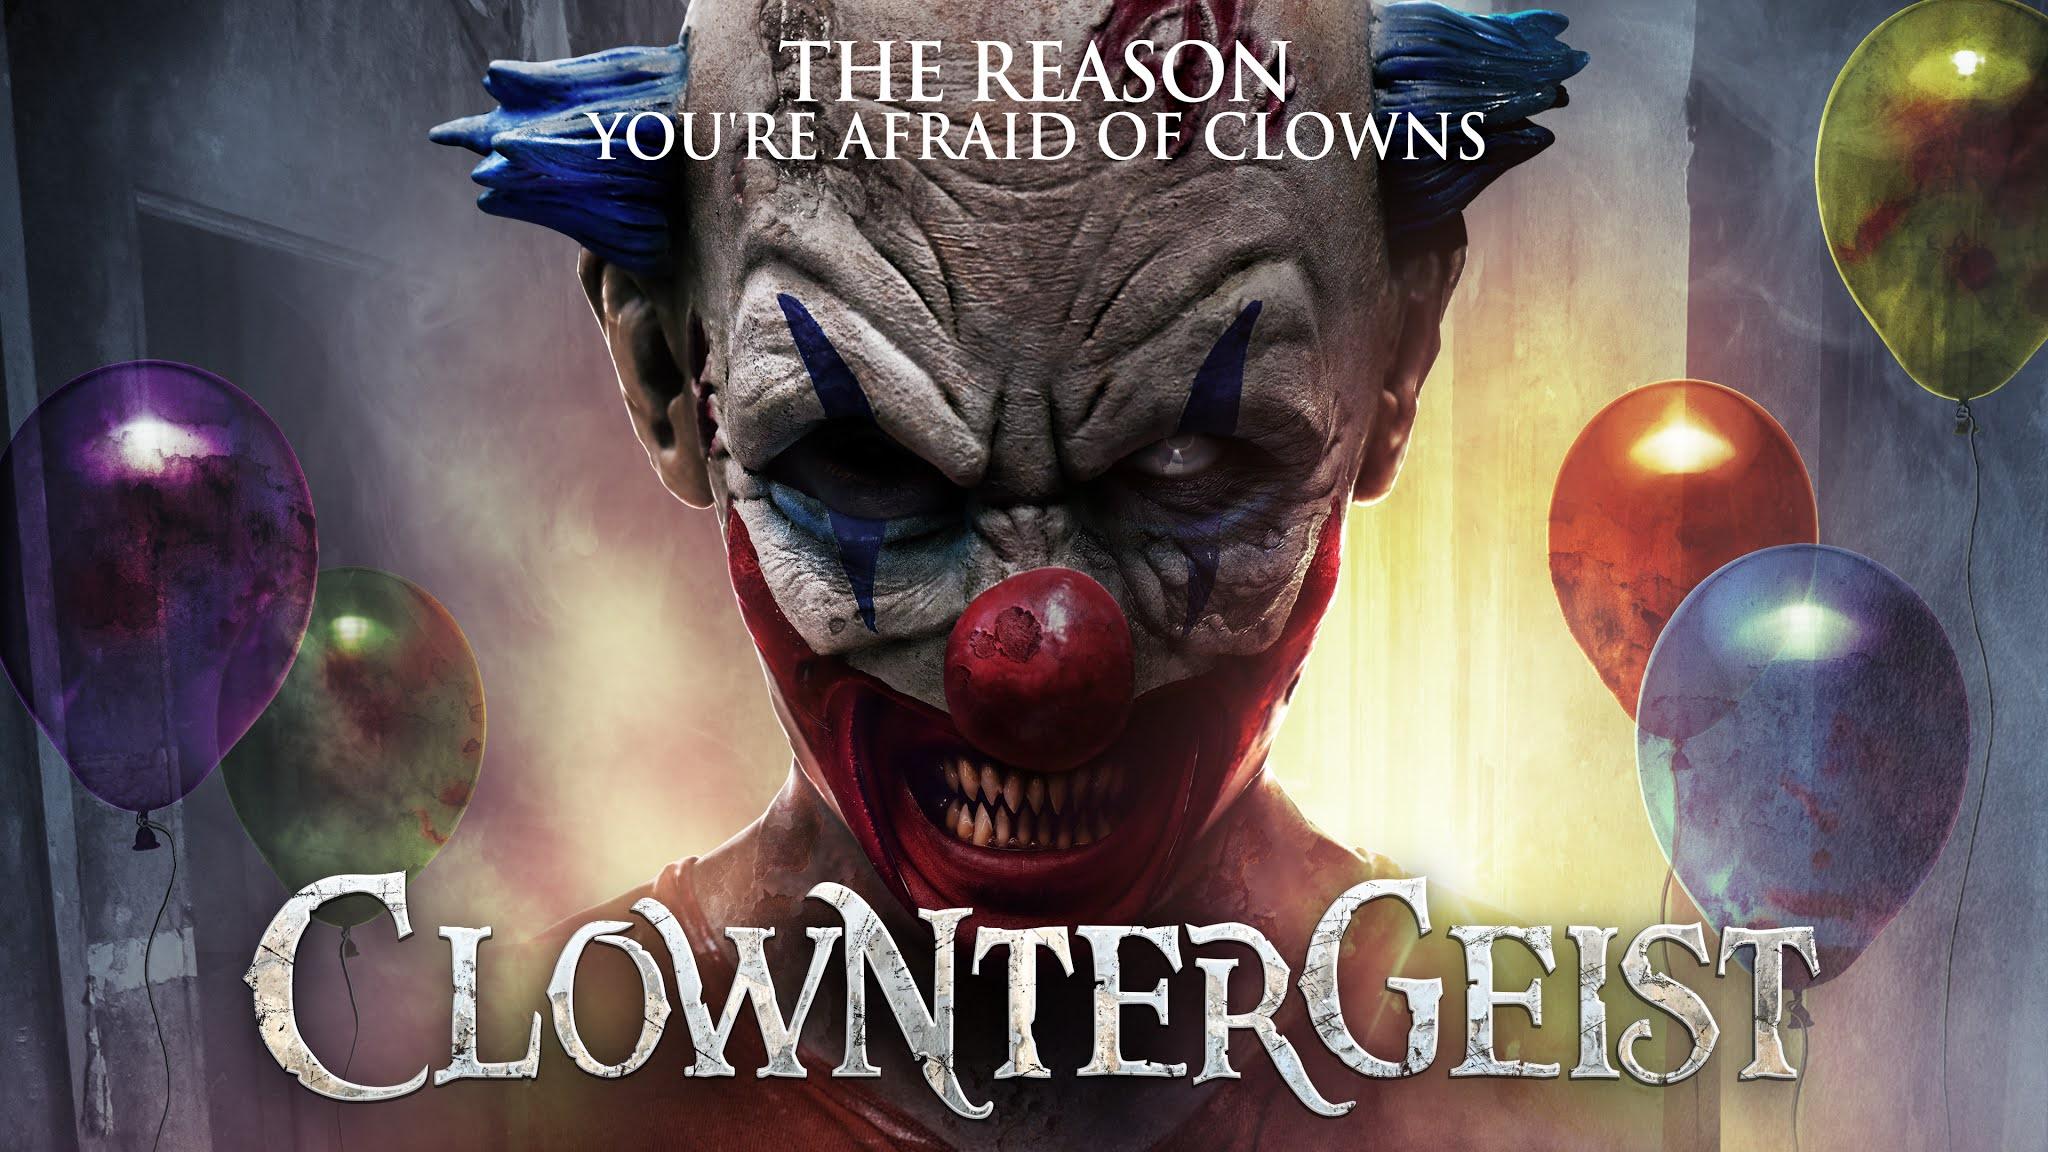 Clowntergeist (2017) WEBDL Subtitle Indonesia